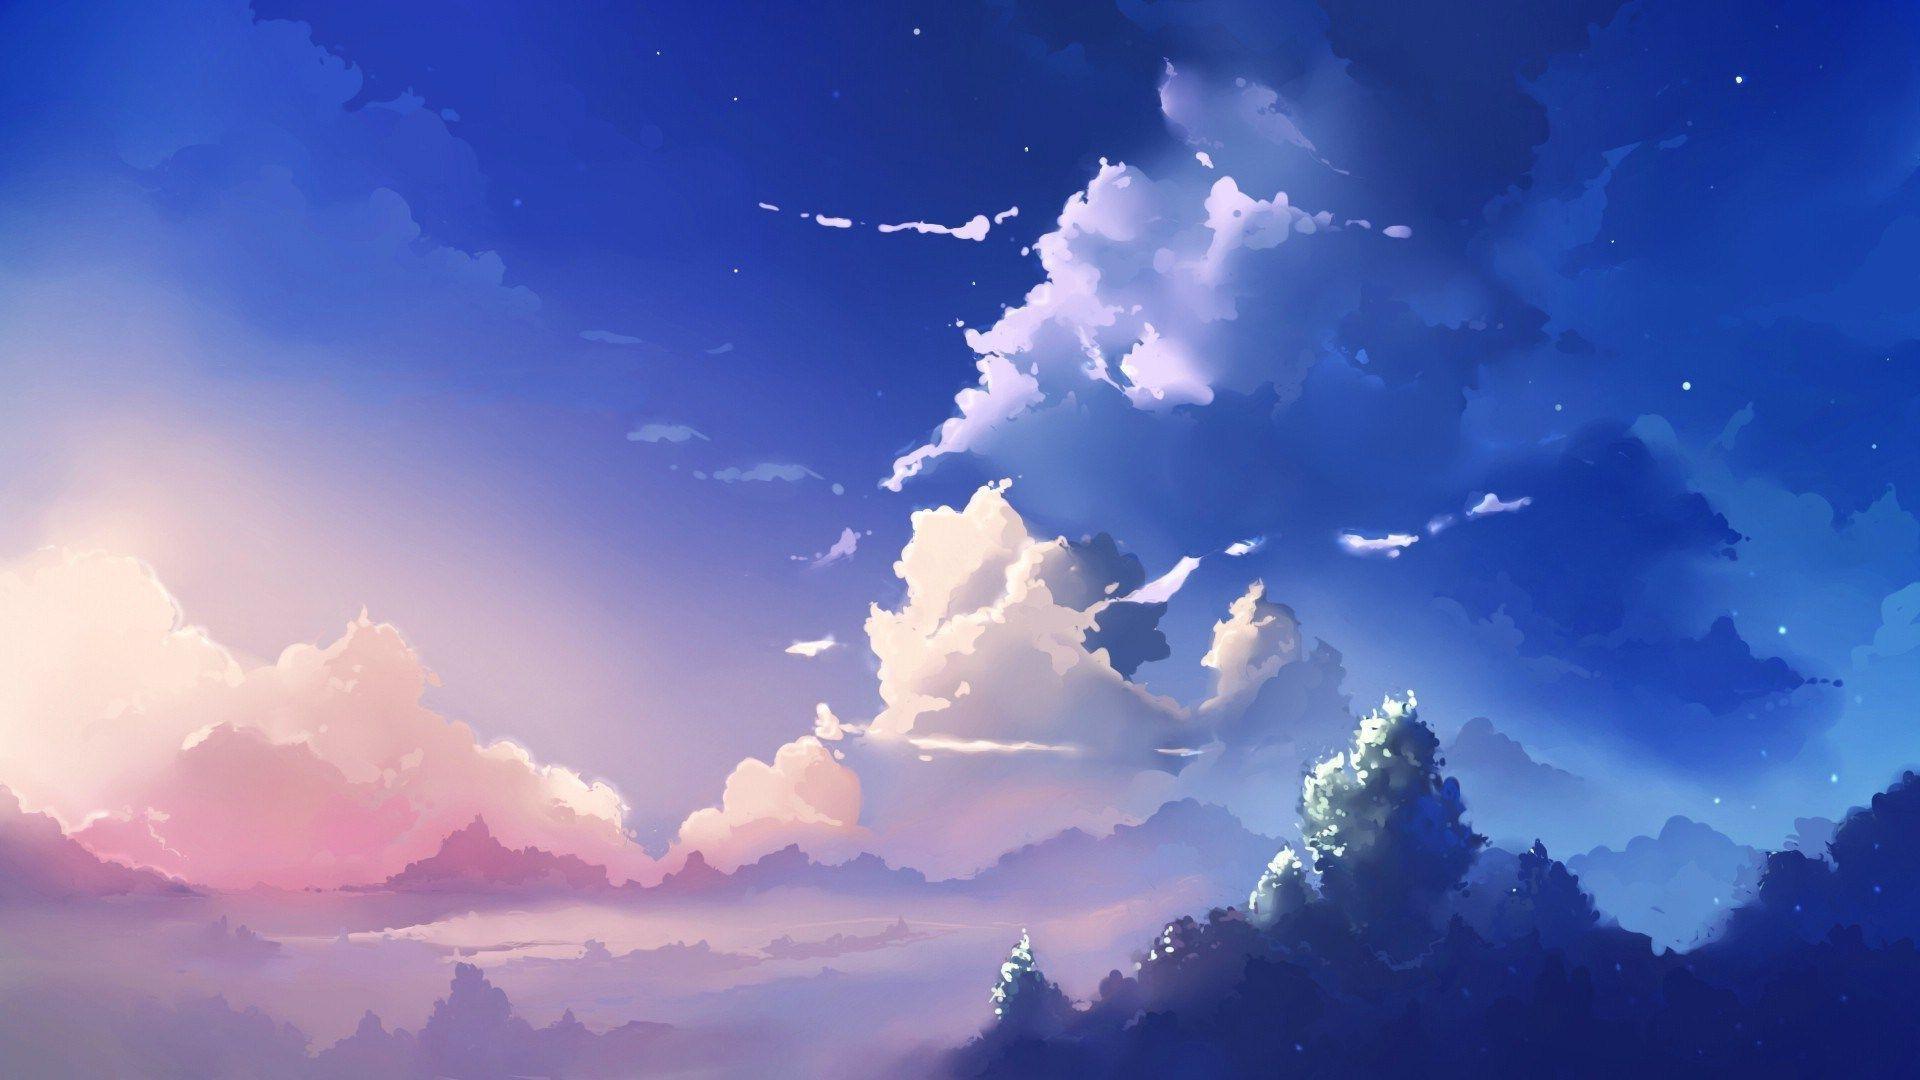 Res 1920x1080 Anime Scenery Wallpapers 1080p For Desktop Px 328 25 Kb Scenery Wallpaper Anime Scenery Anime Scenery Wallpaper